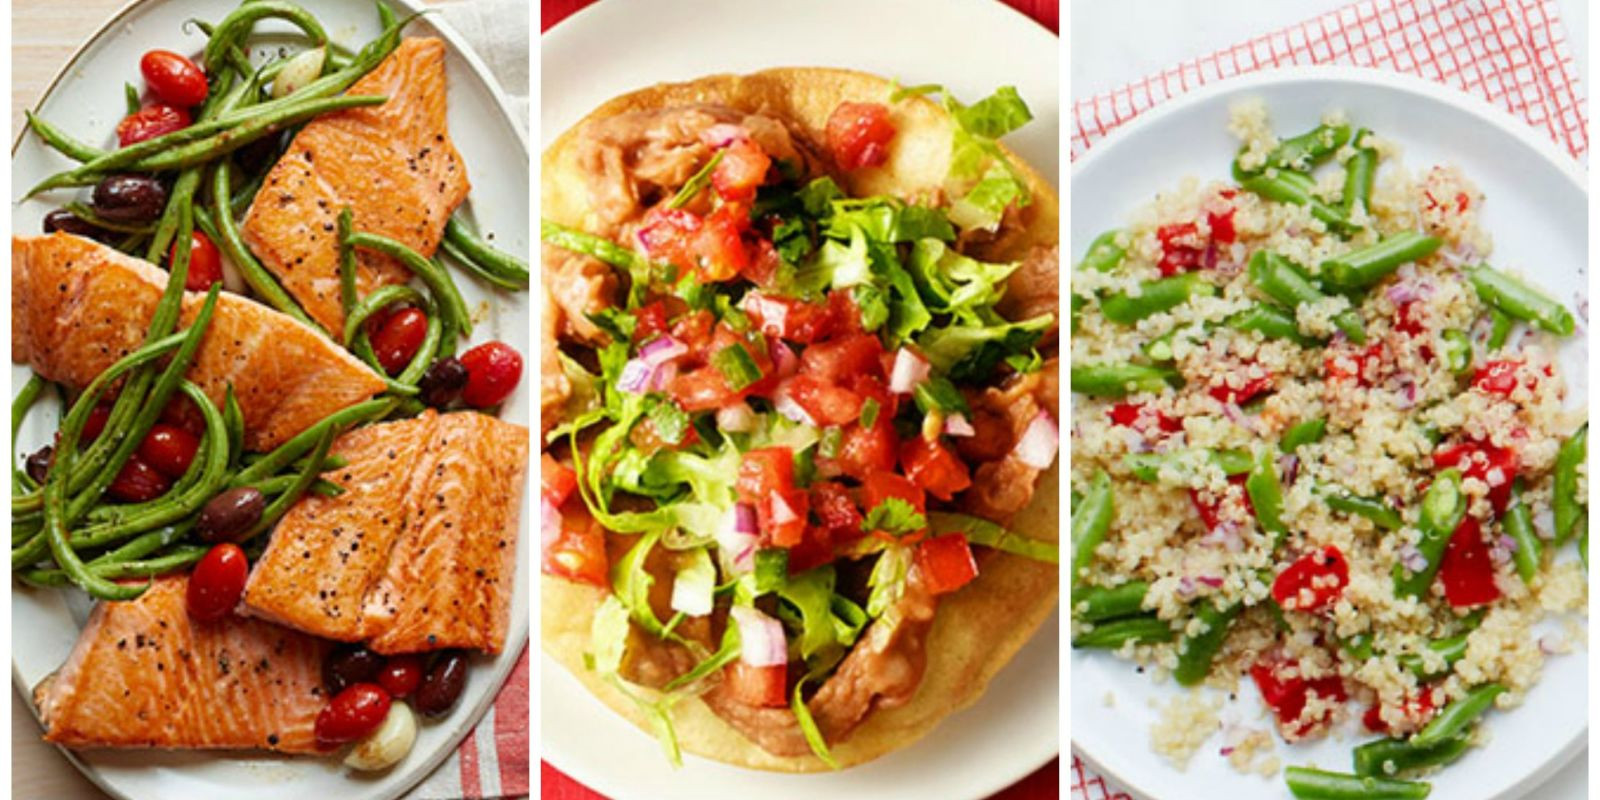 Healthy Heart Recipes  15 Easy Heart Healthy Recipes Quick Heart Healthy Meals